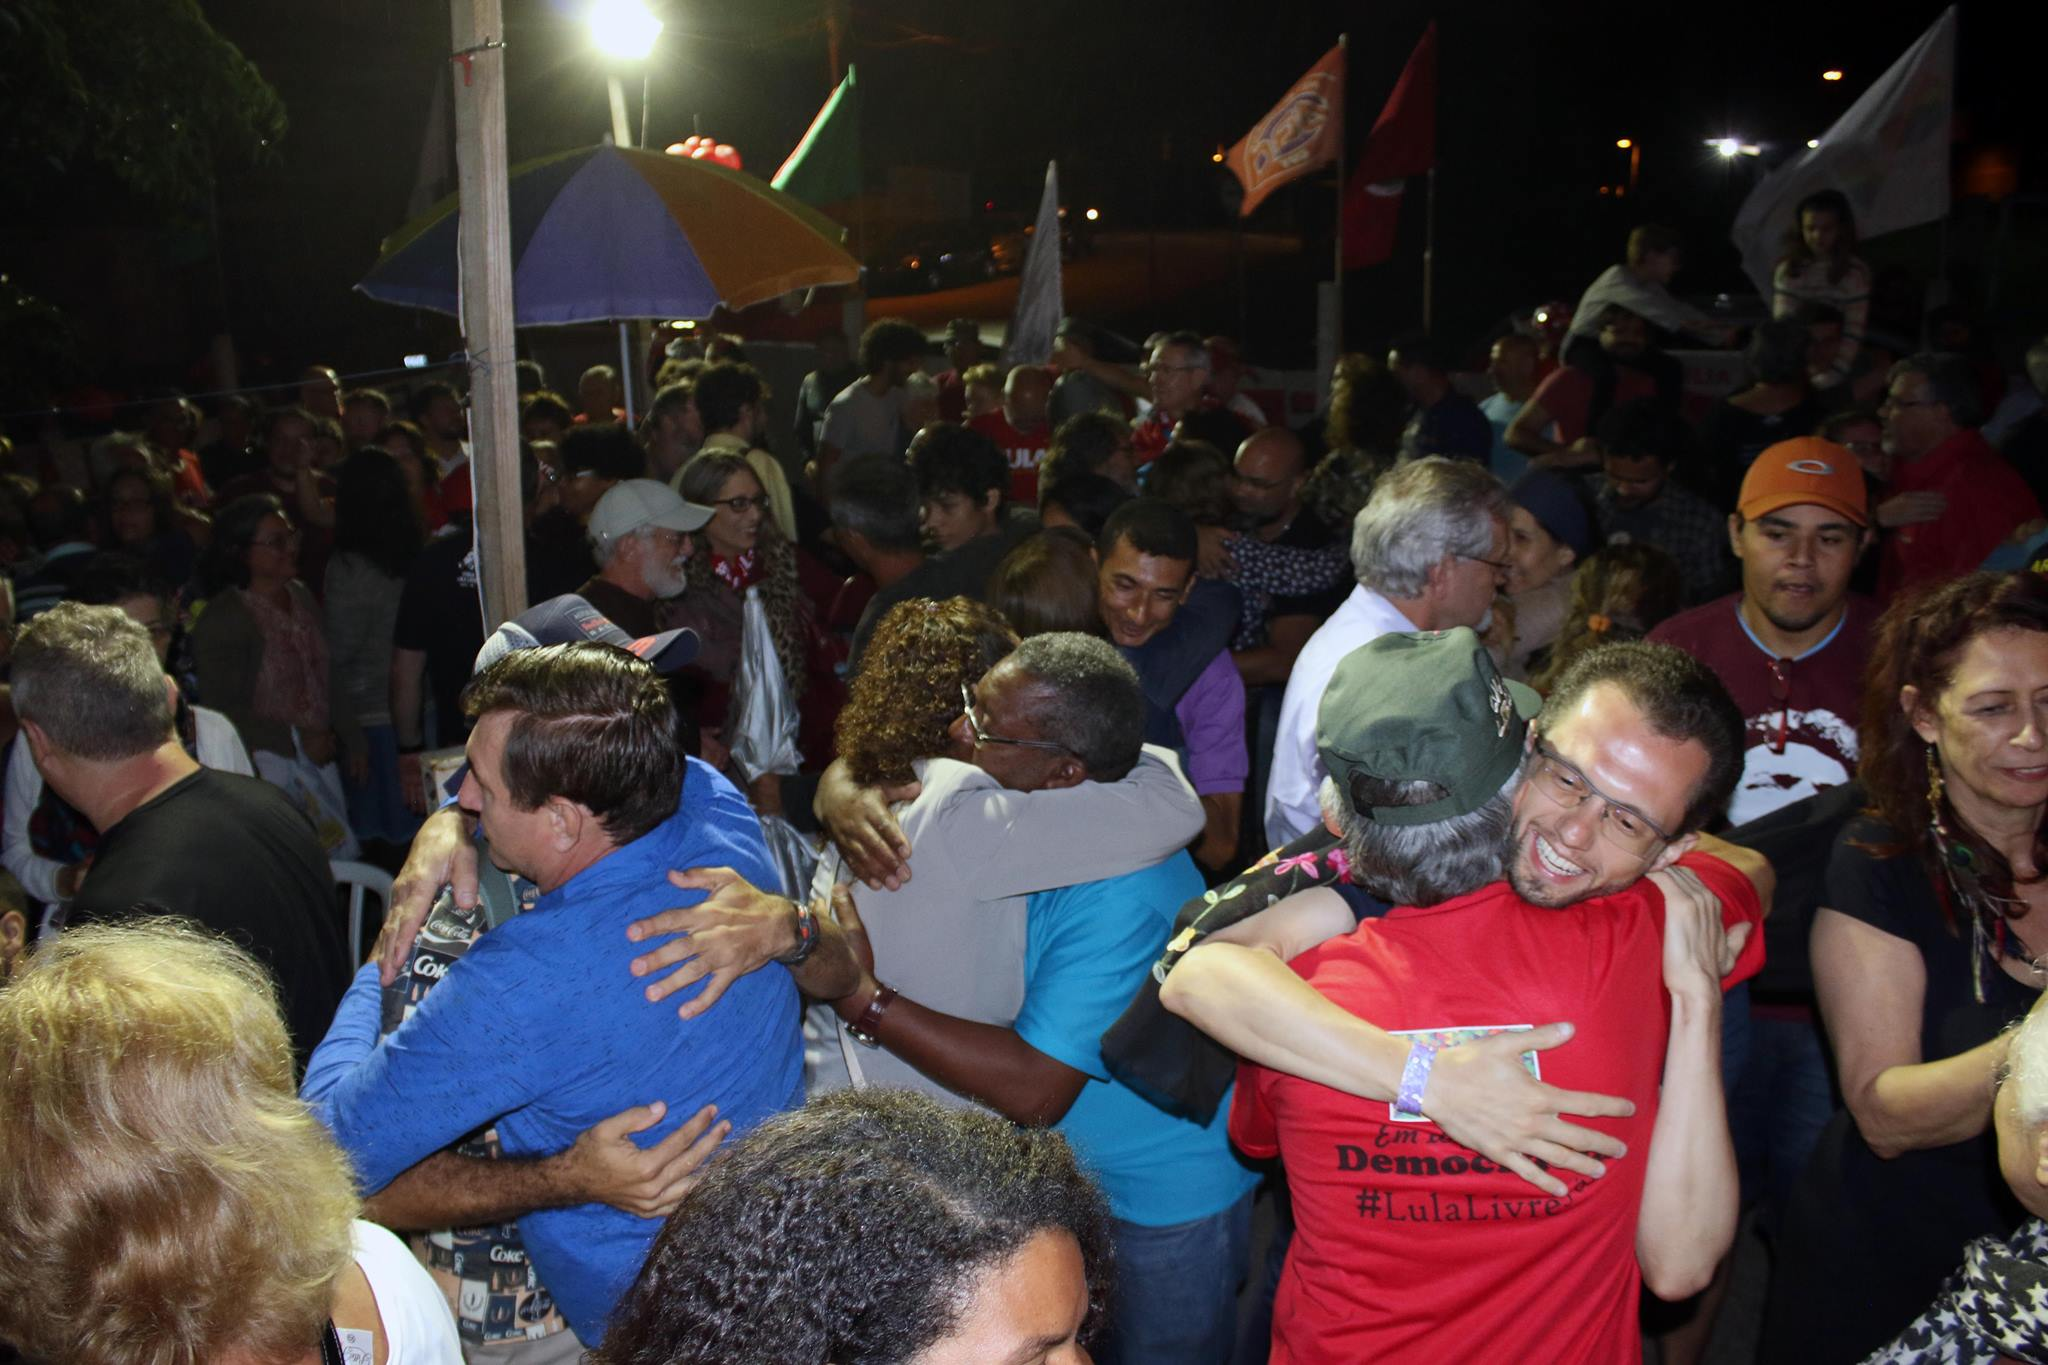 FOTO34-Jornalistas Livres